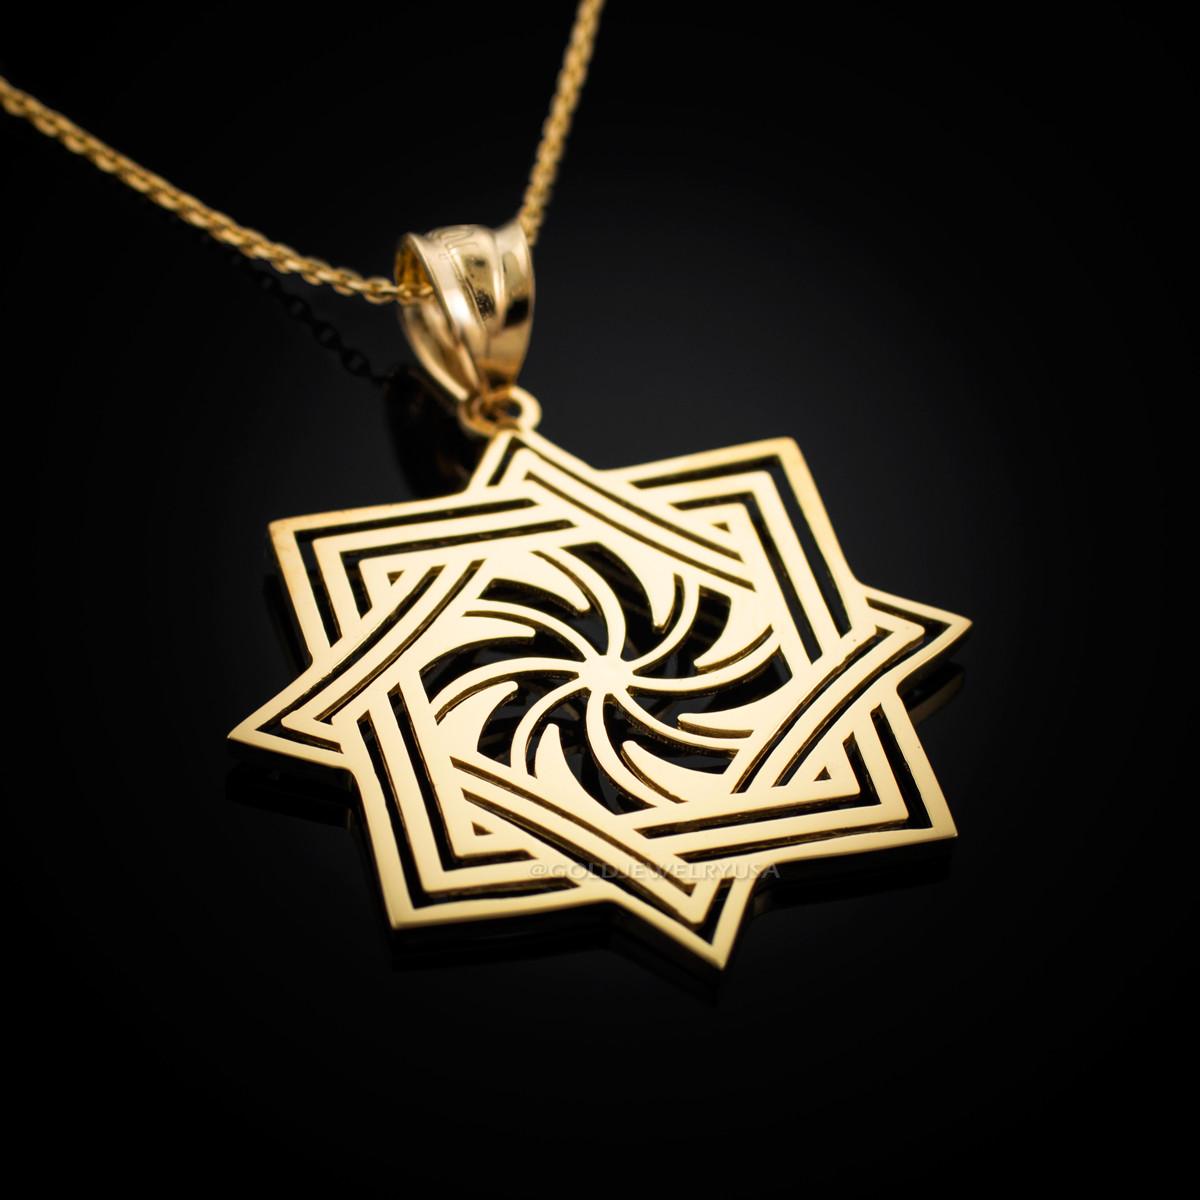 Gold Armenian Eternity Symbol Pendant Necklace